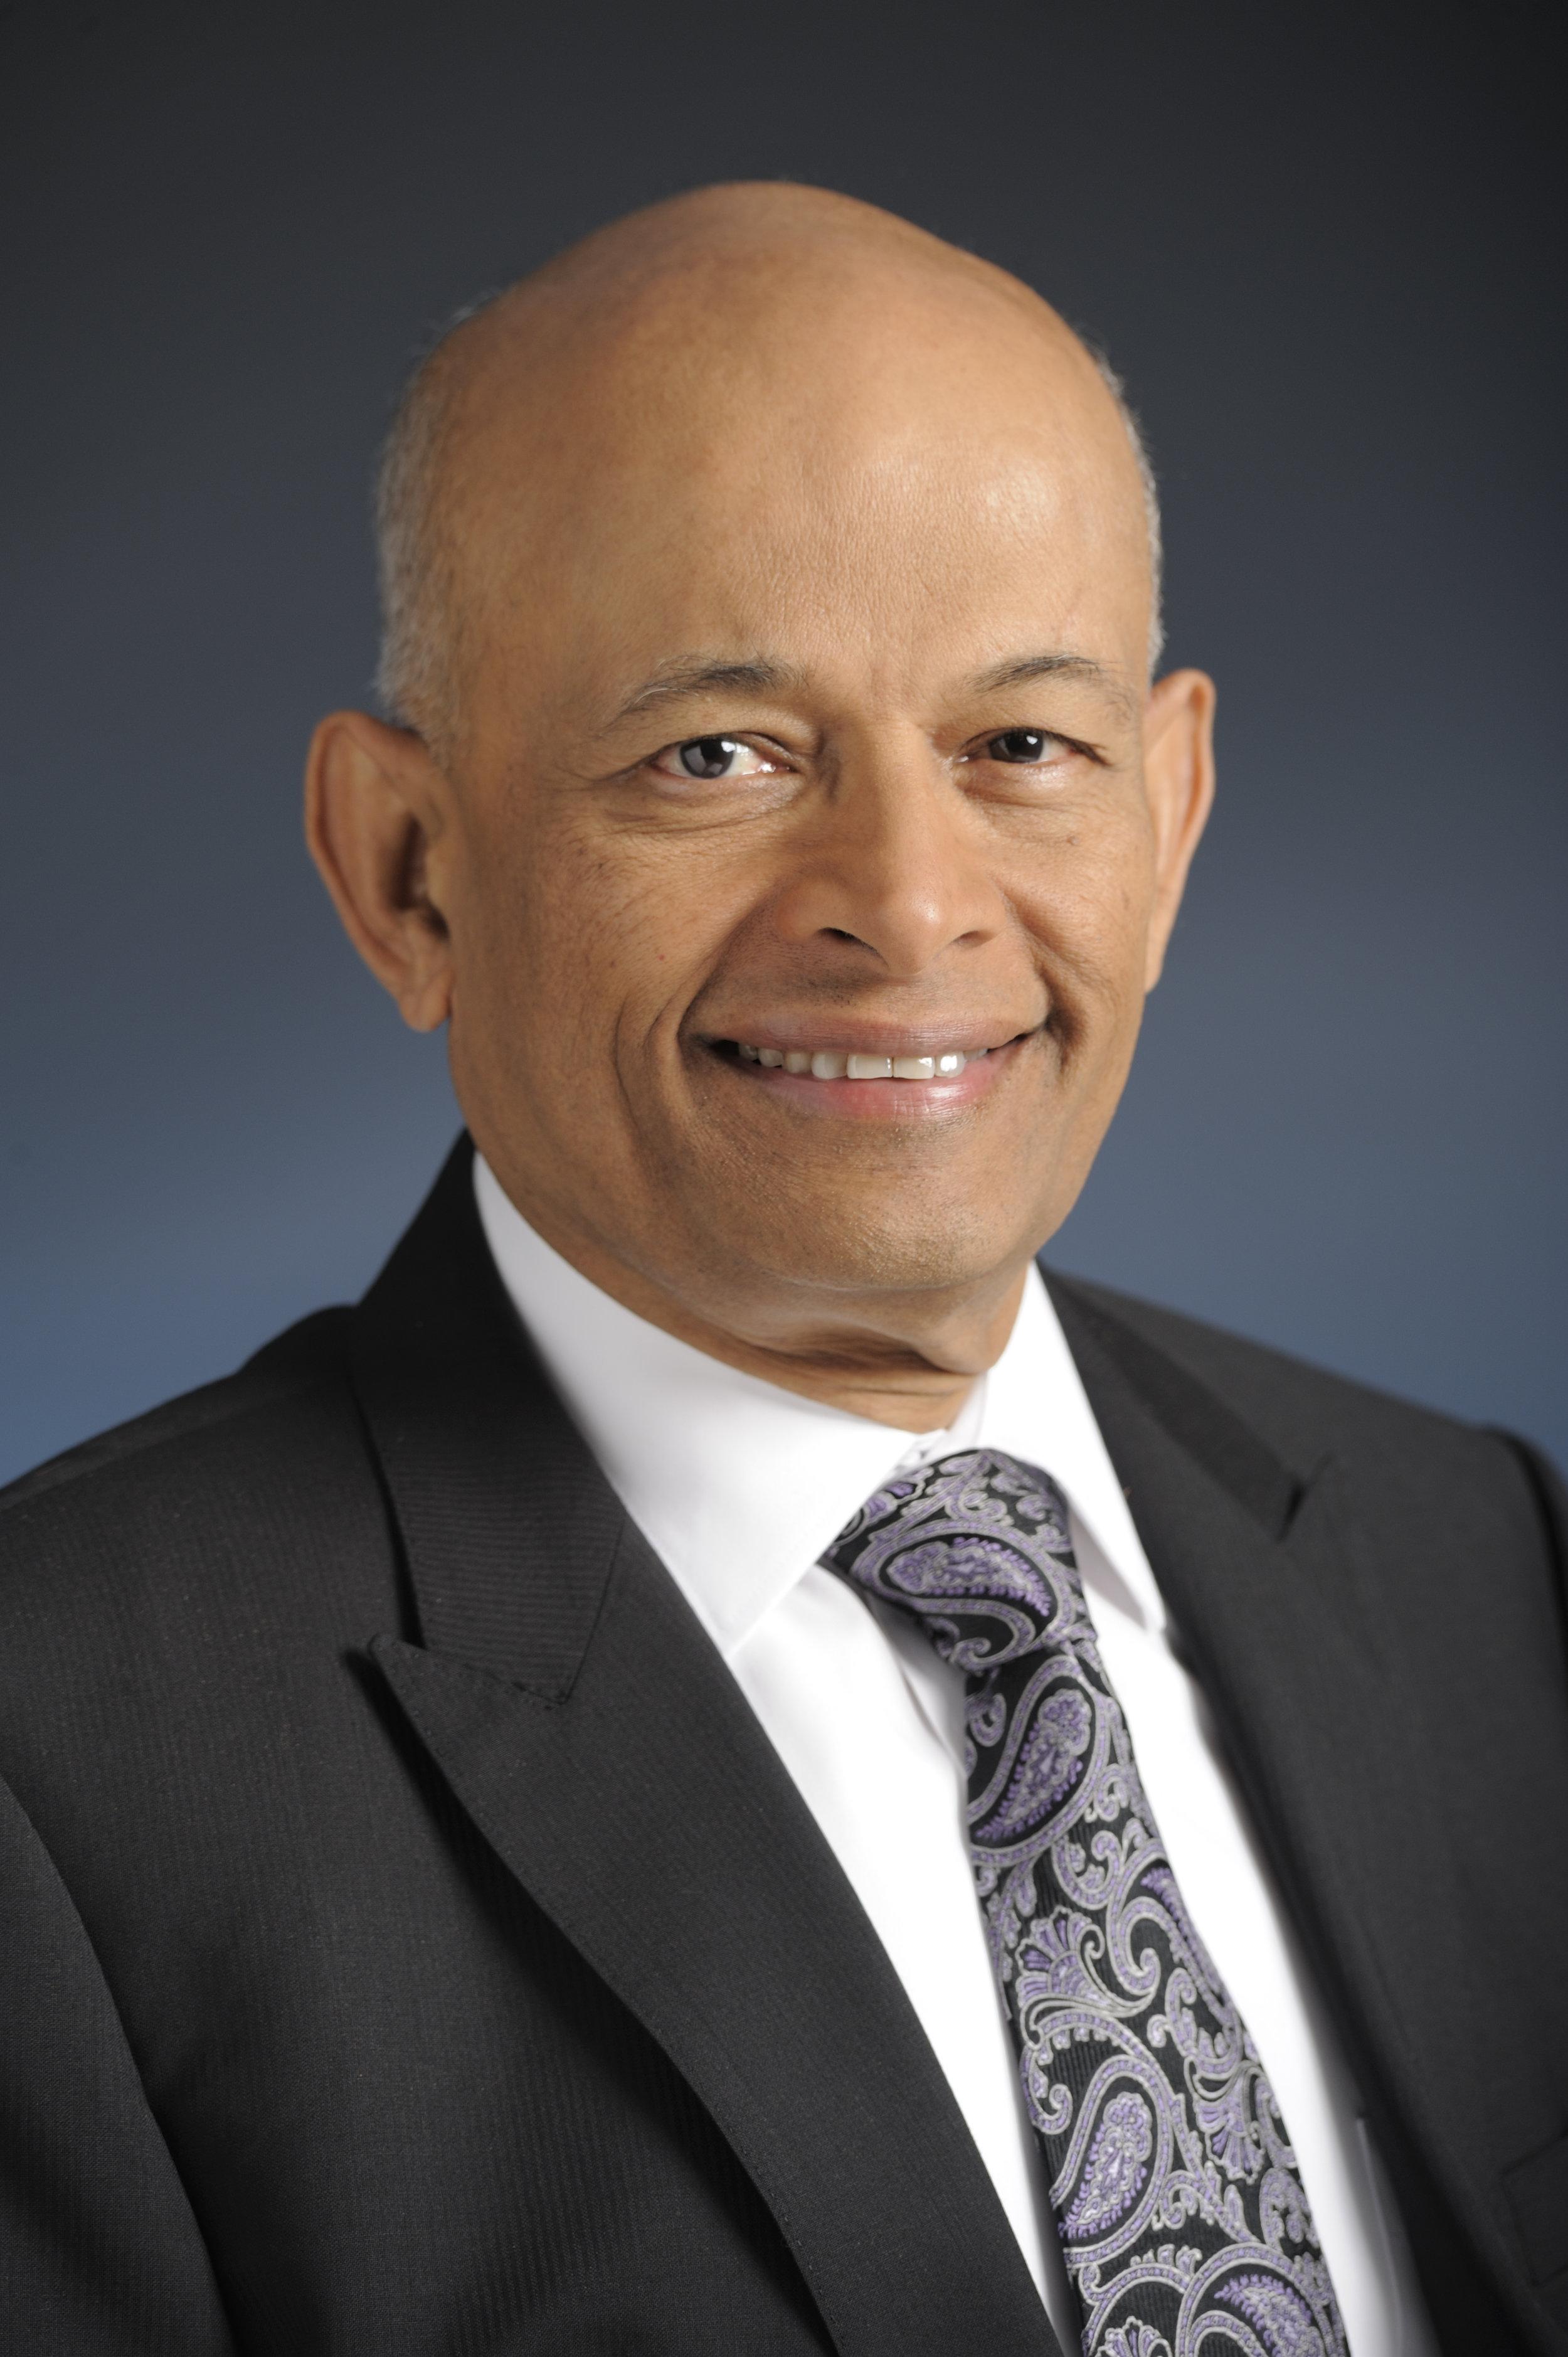 Hanu Reddy - President & Managing Broker     CA DRE LIC #00772535    Direct: 949.829.3499    hanureddy@hanureddyrealty.com